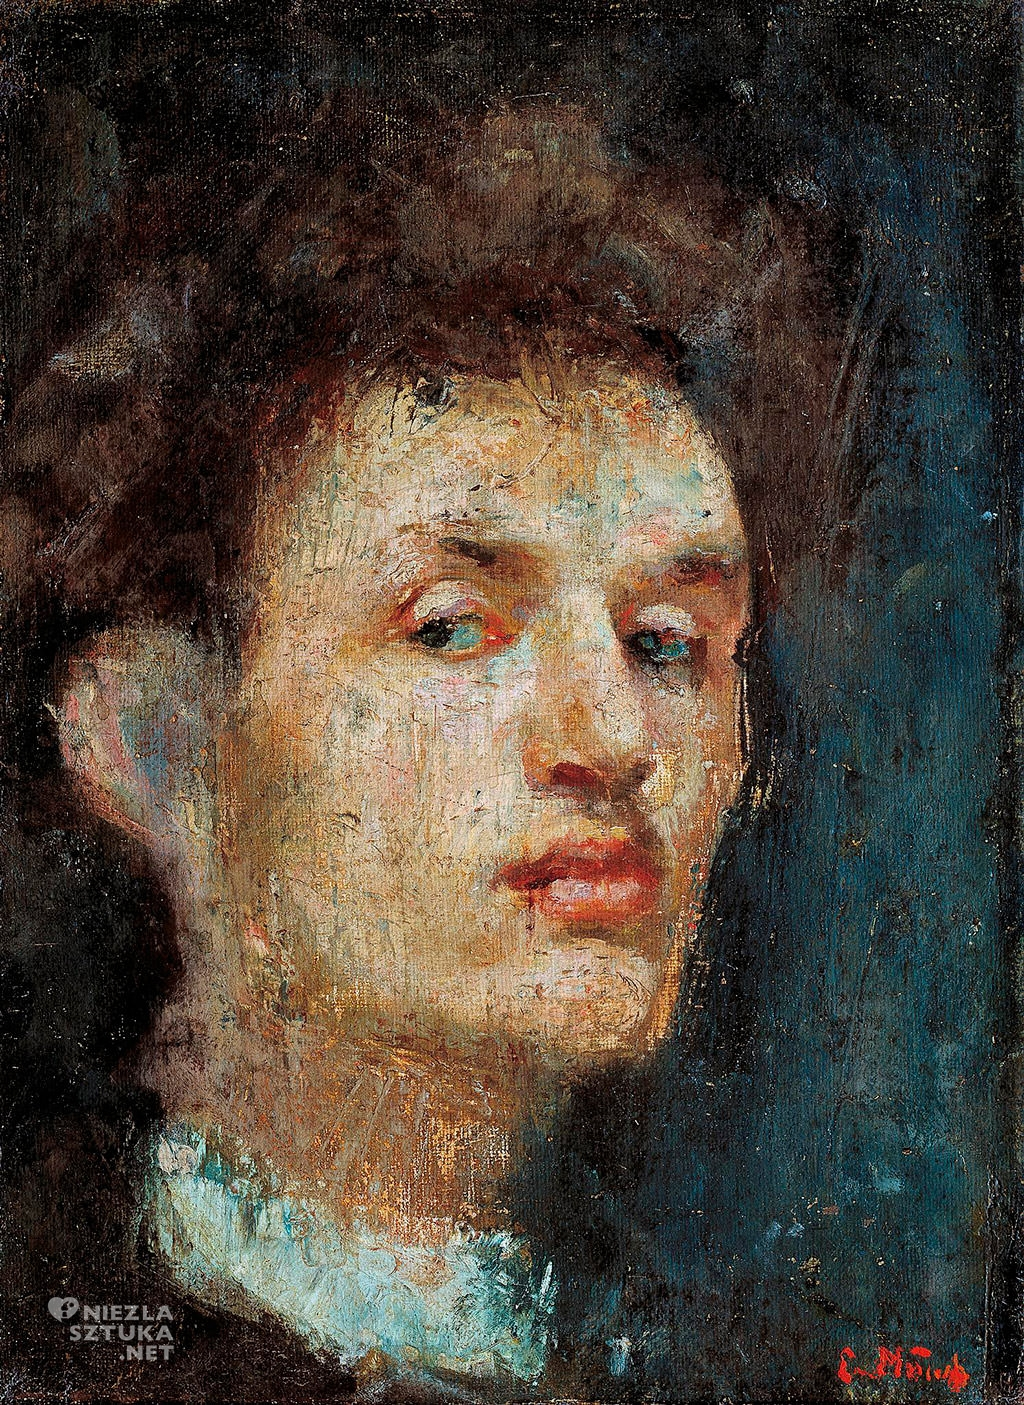 Edvard Munch Autoportret | 1886, Munch Museum, Oslo